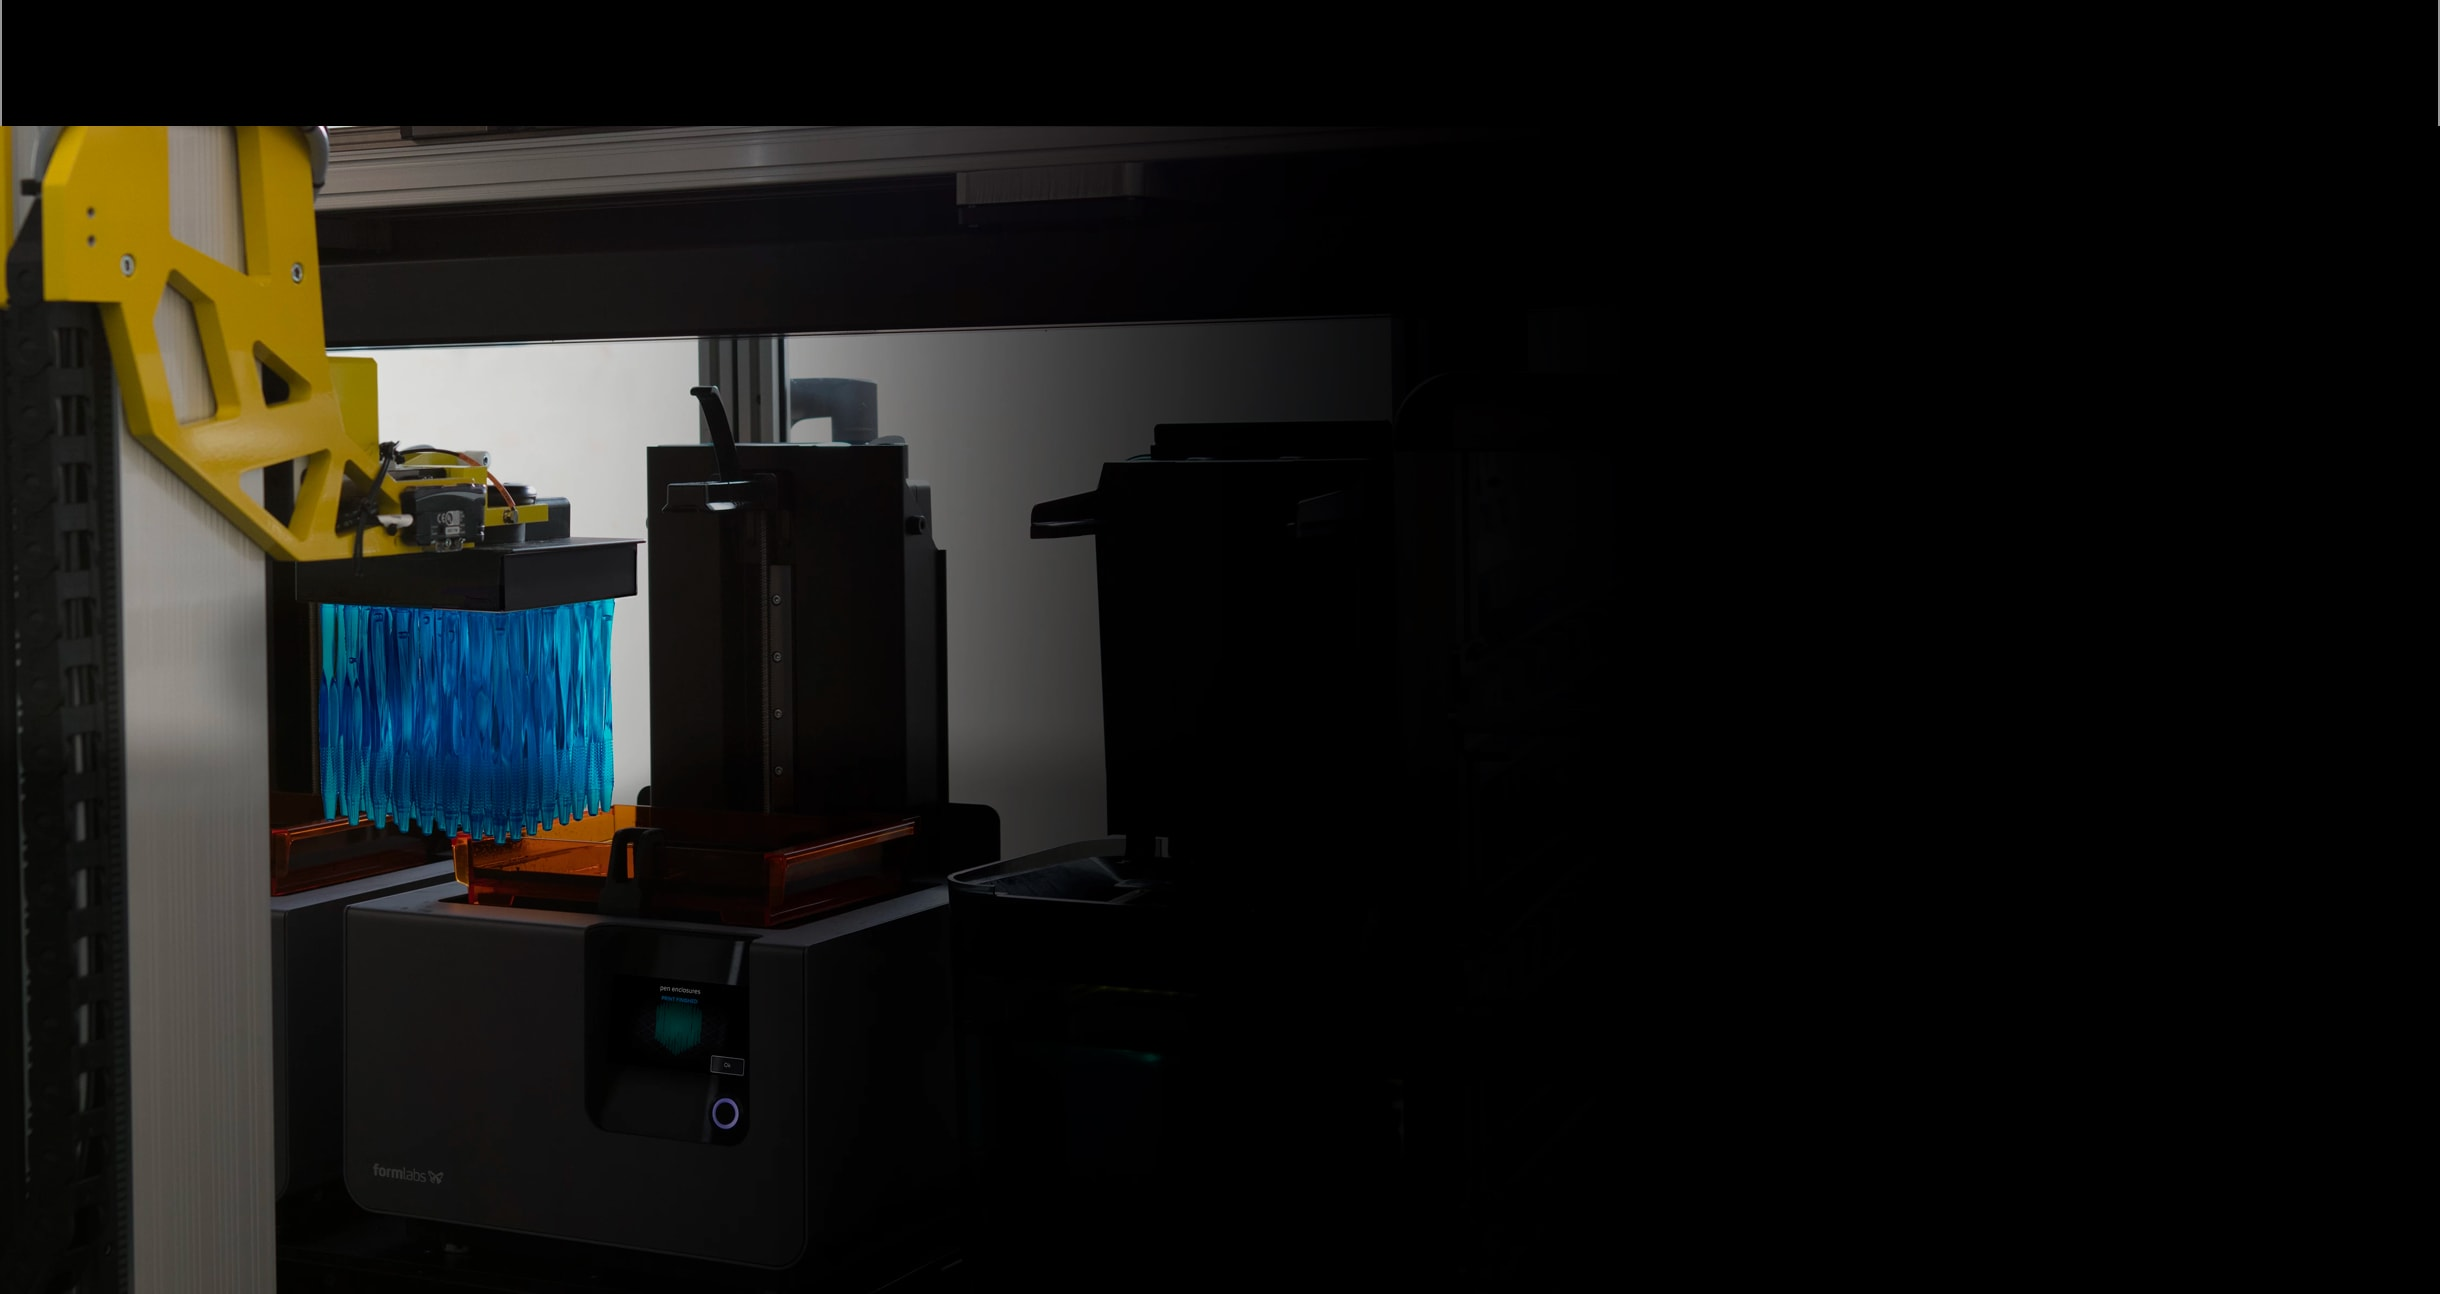 Formlabs automatisierte Fertigungslösung [Form Cell](/ch/3d-printers/form-cell/) parallelisiert 3D-Druck und Nachbearbeitung.